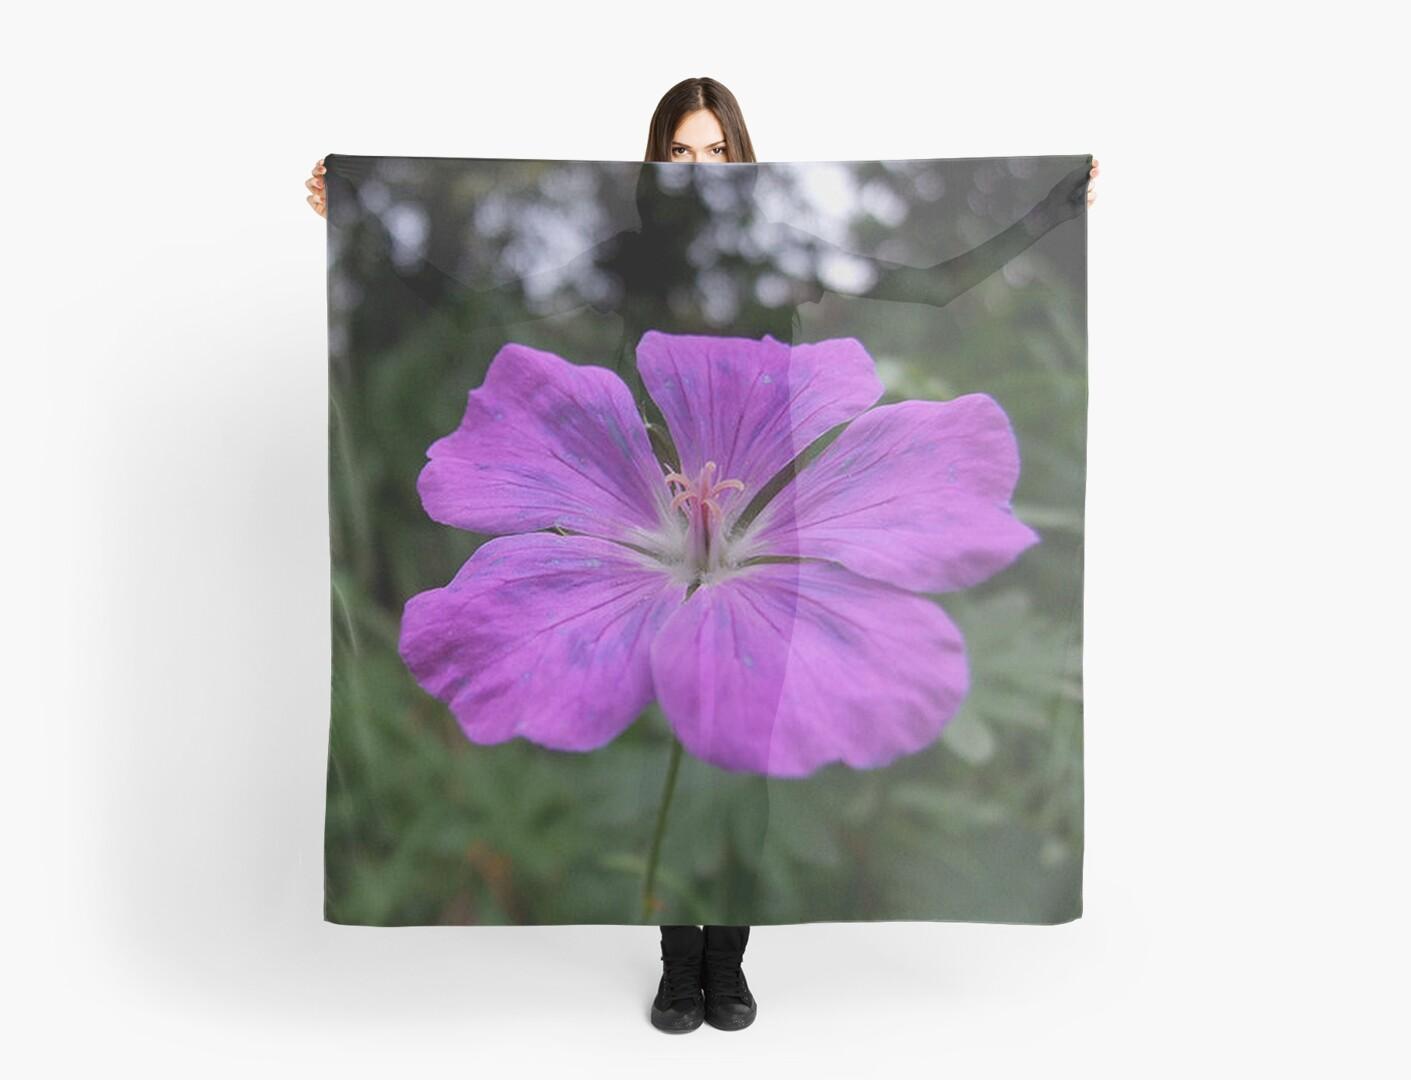 Violet Viola Flower With Garden Background by taiche